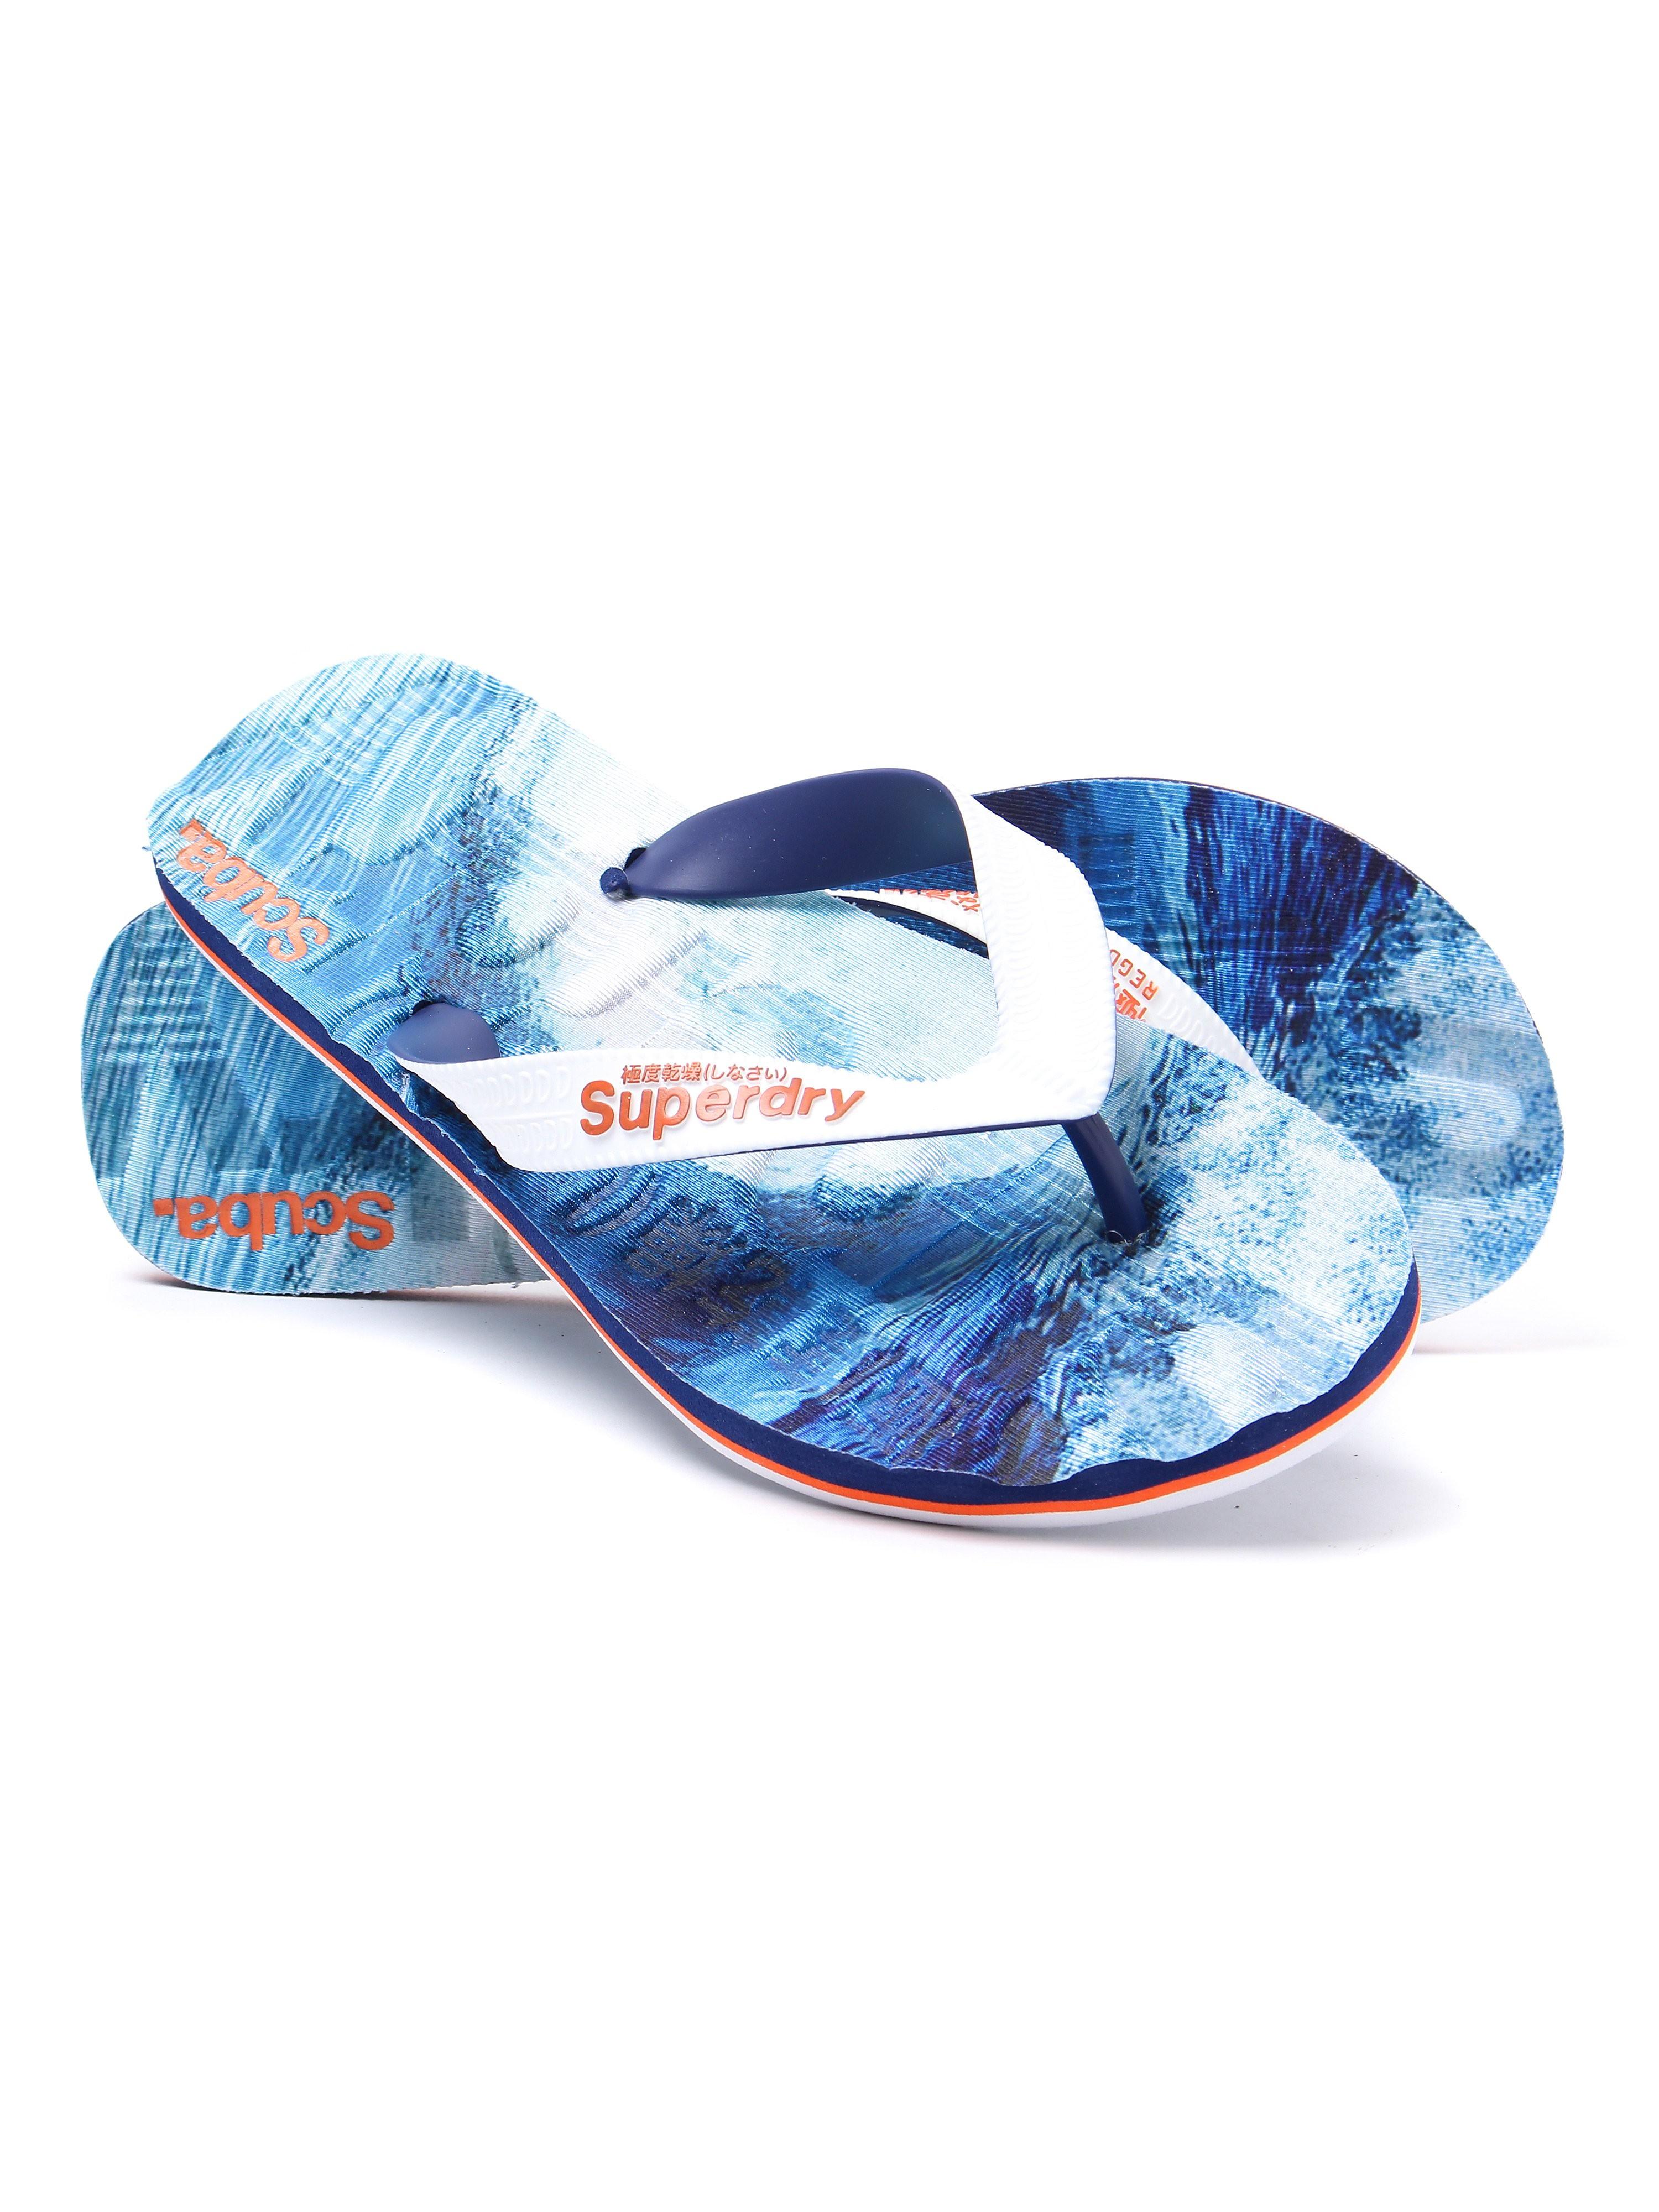 Superdry Men's Scuba Lightweight Flip Flops - Blue Tube Ride